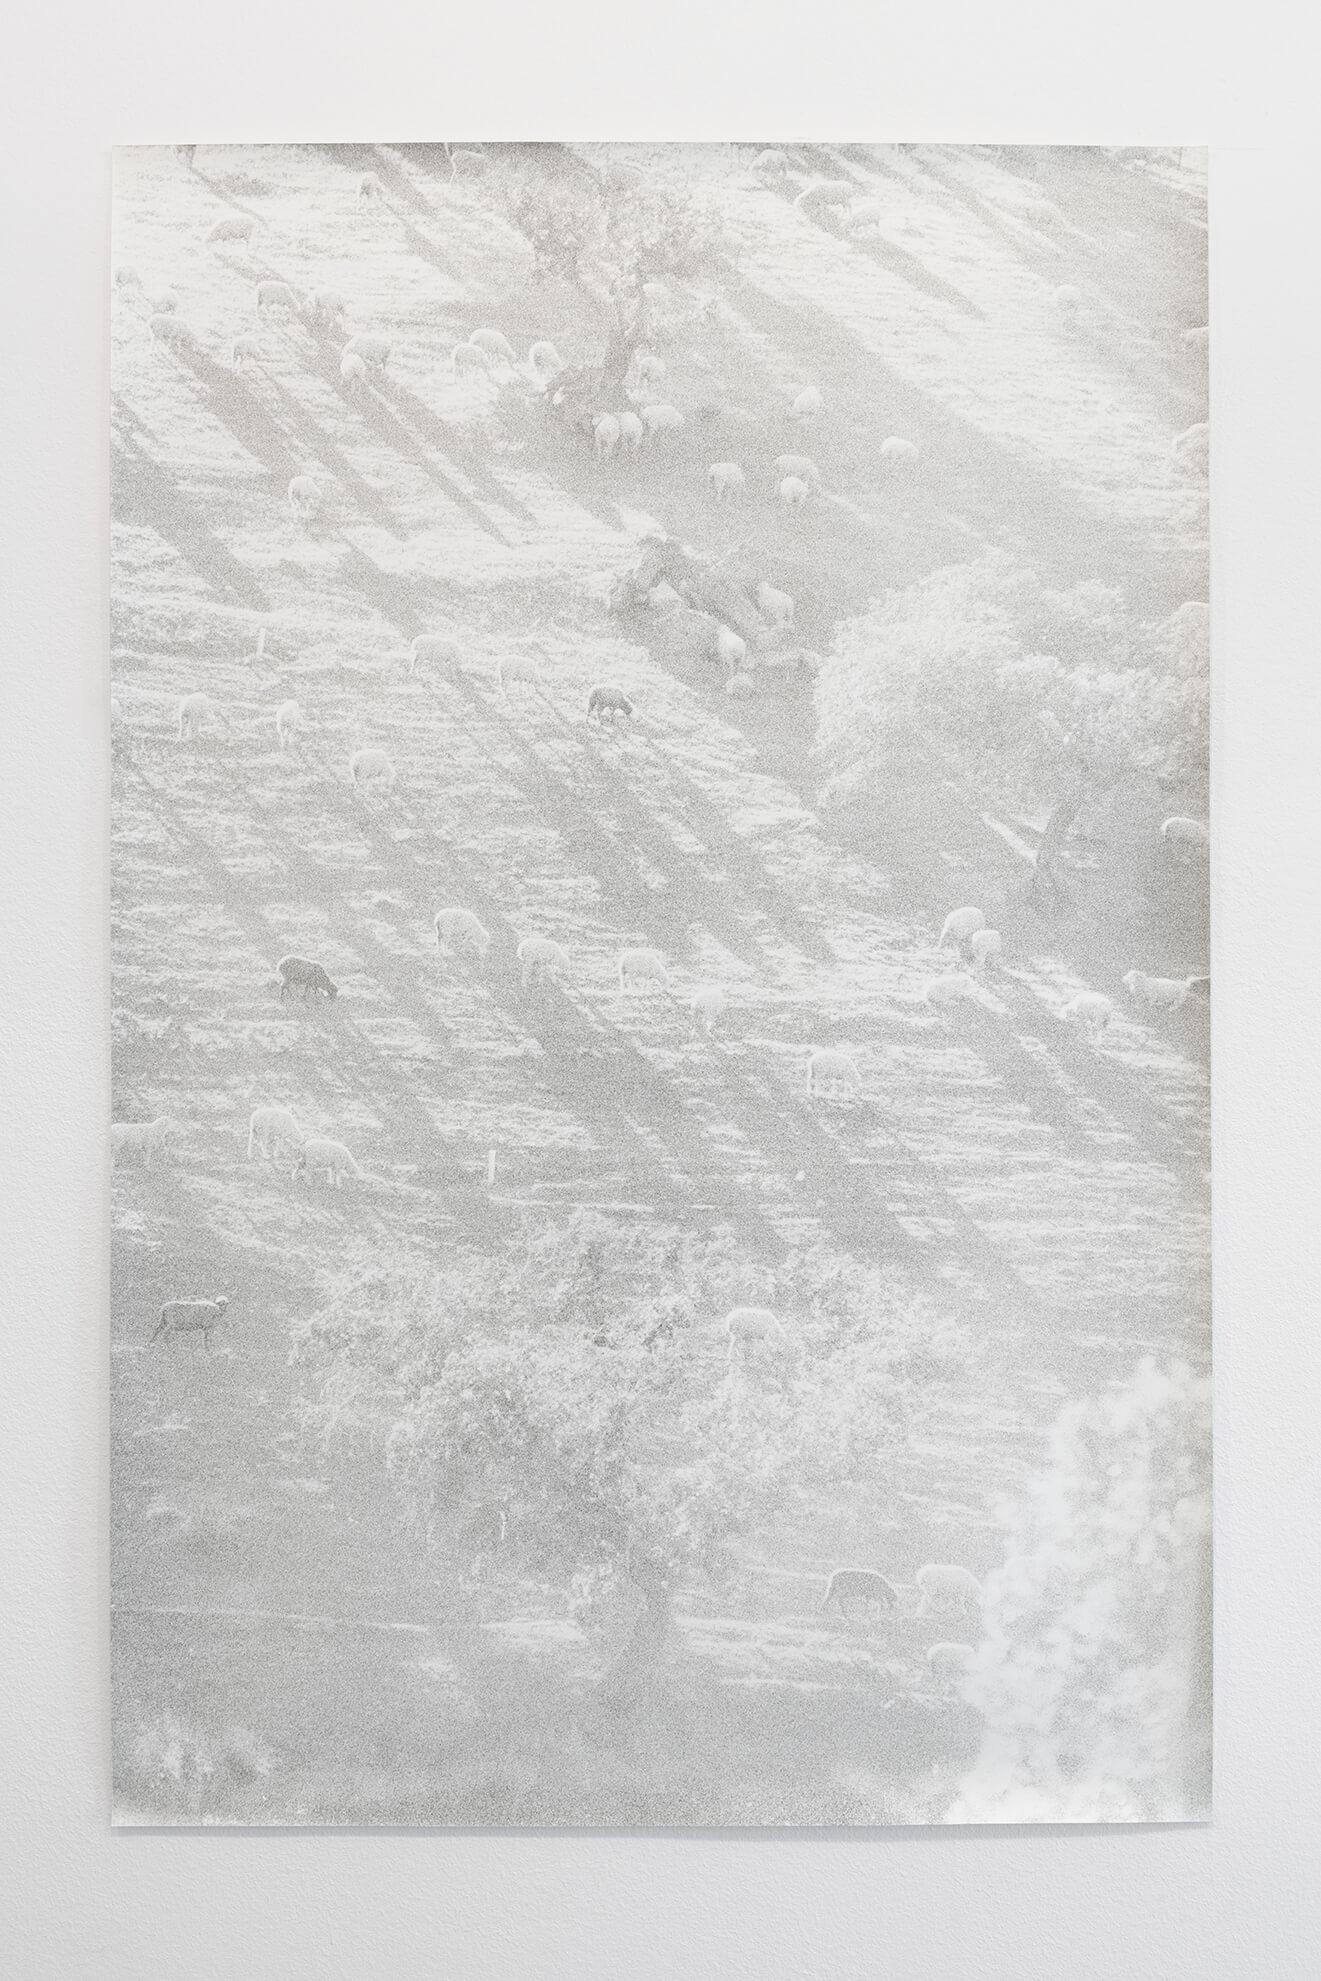 Untitled (Sheeps), 2021 | JOCHEN LEMPERT: VISIBLE LIGHT | ProjecteSD